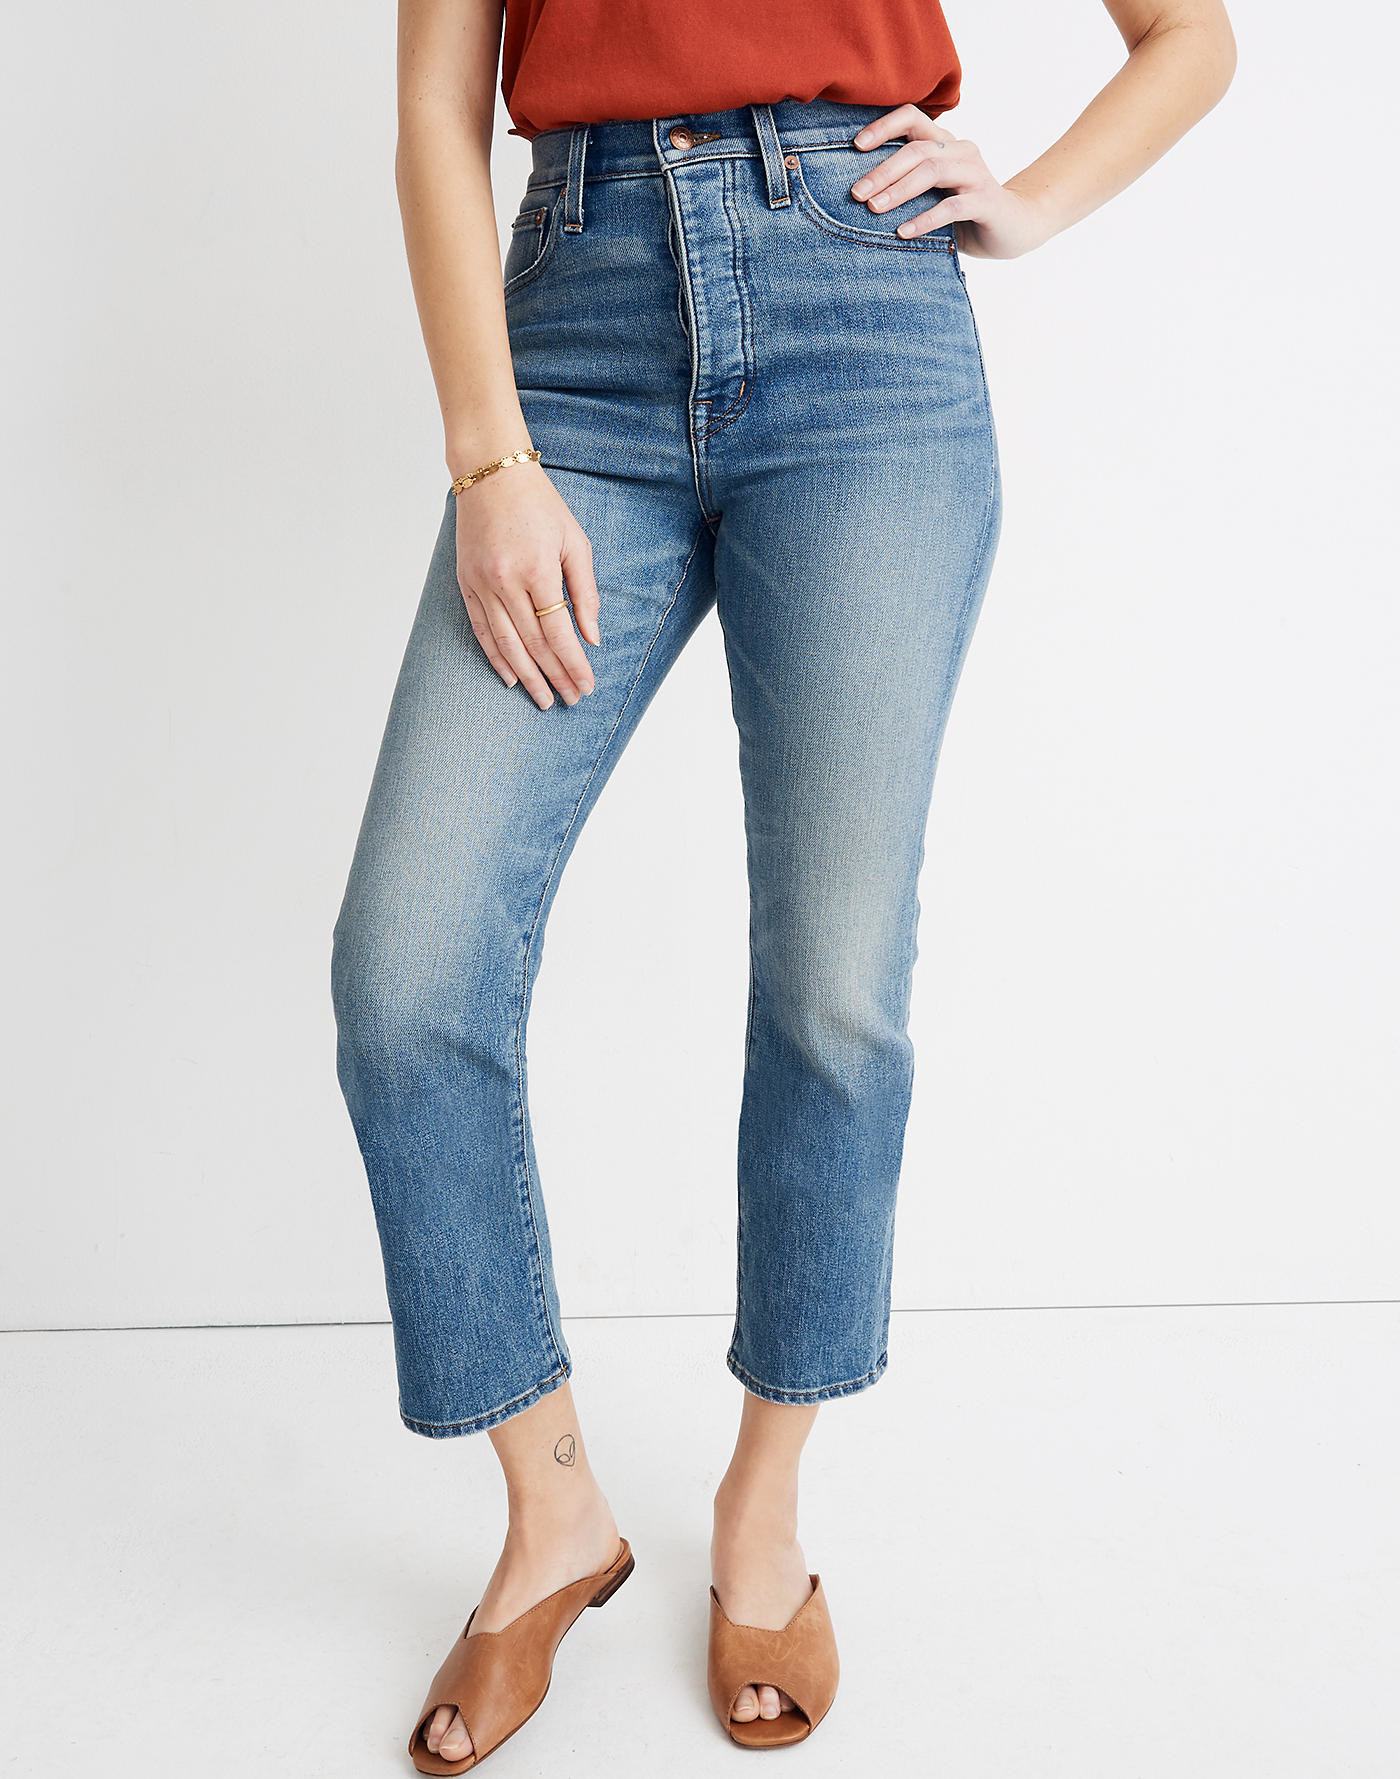 Model wearing medium wash jeans